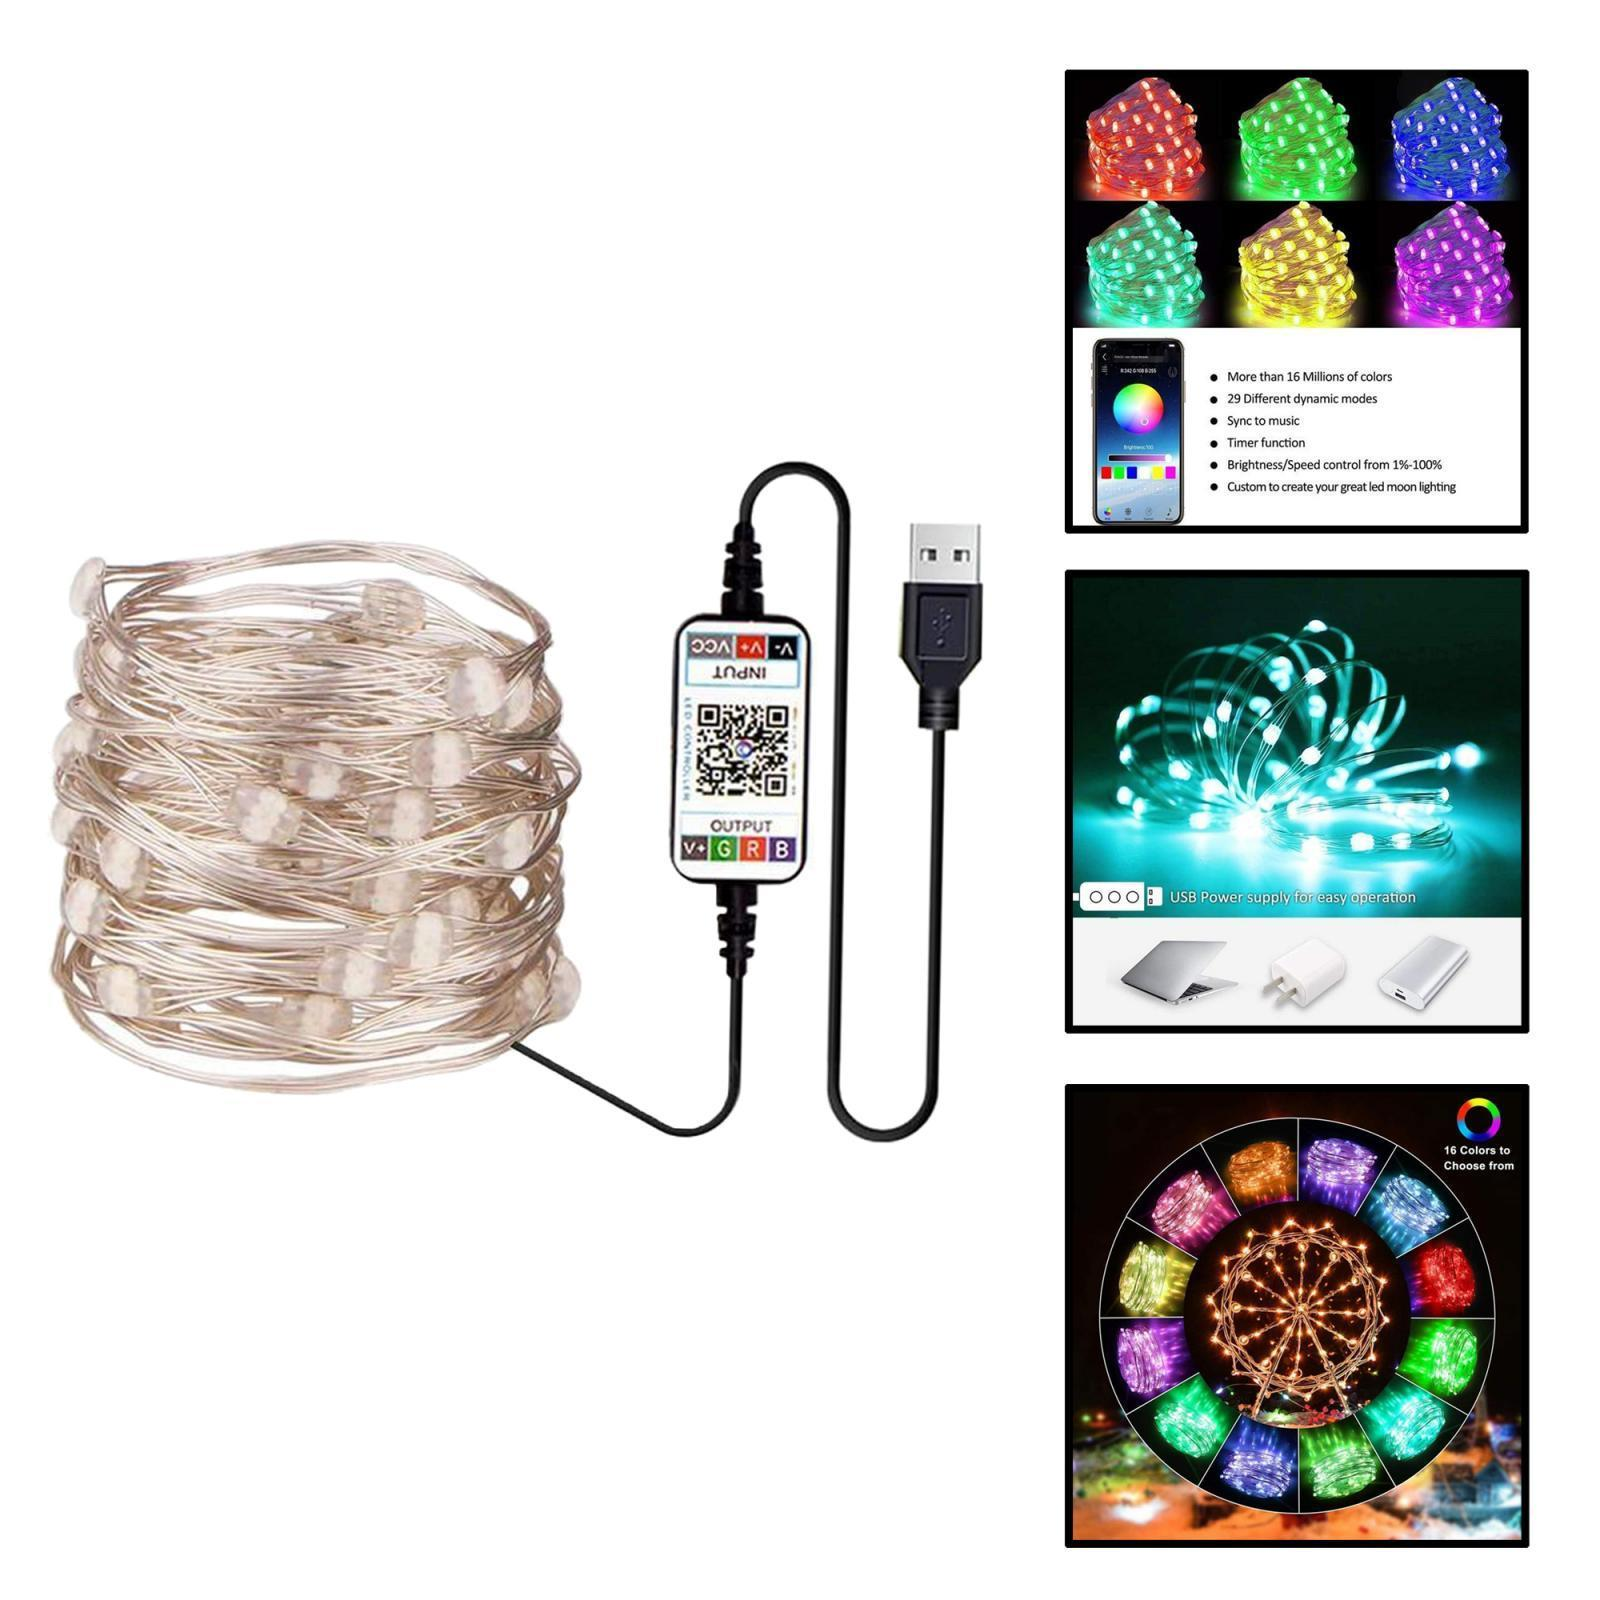 miniature 12 - LED Fée Guirlande Lumineuse Rideau Fenêtre De Mariage Party Decor App Contrôl